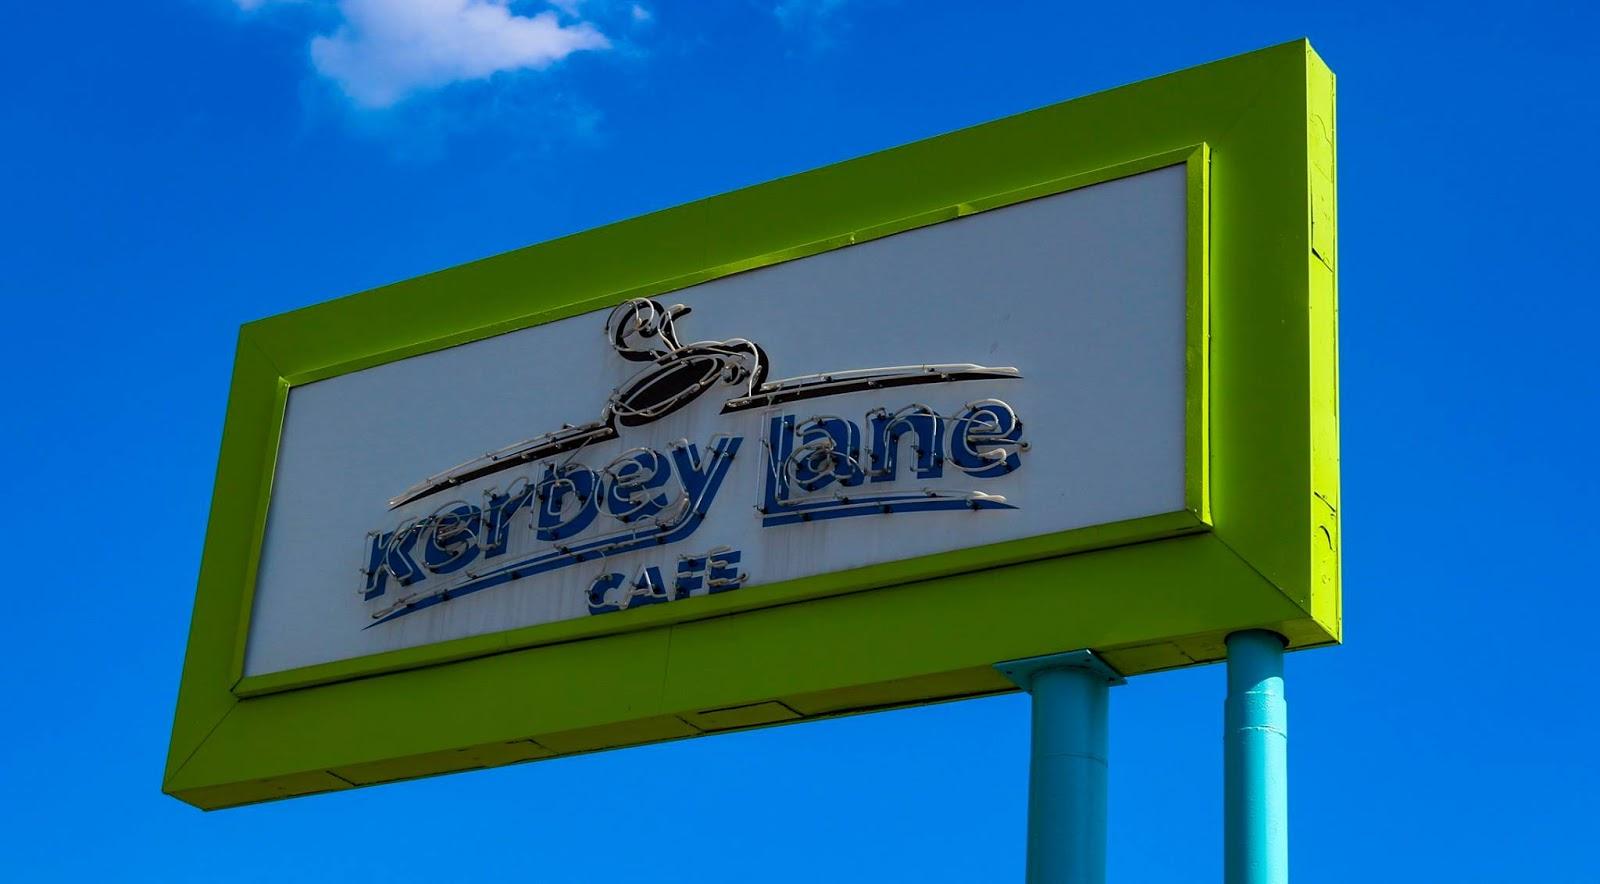 Kerby Lane